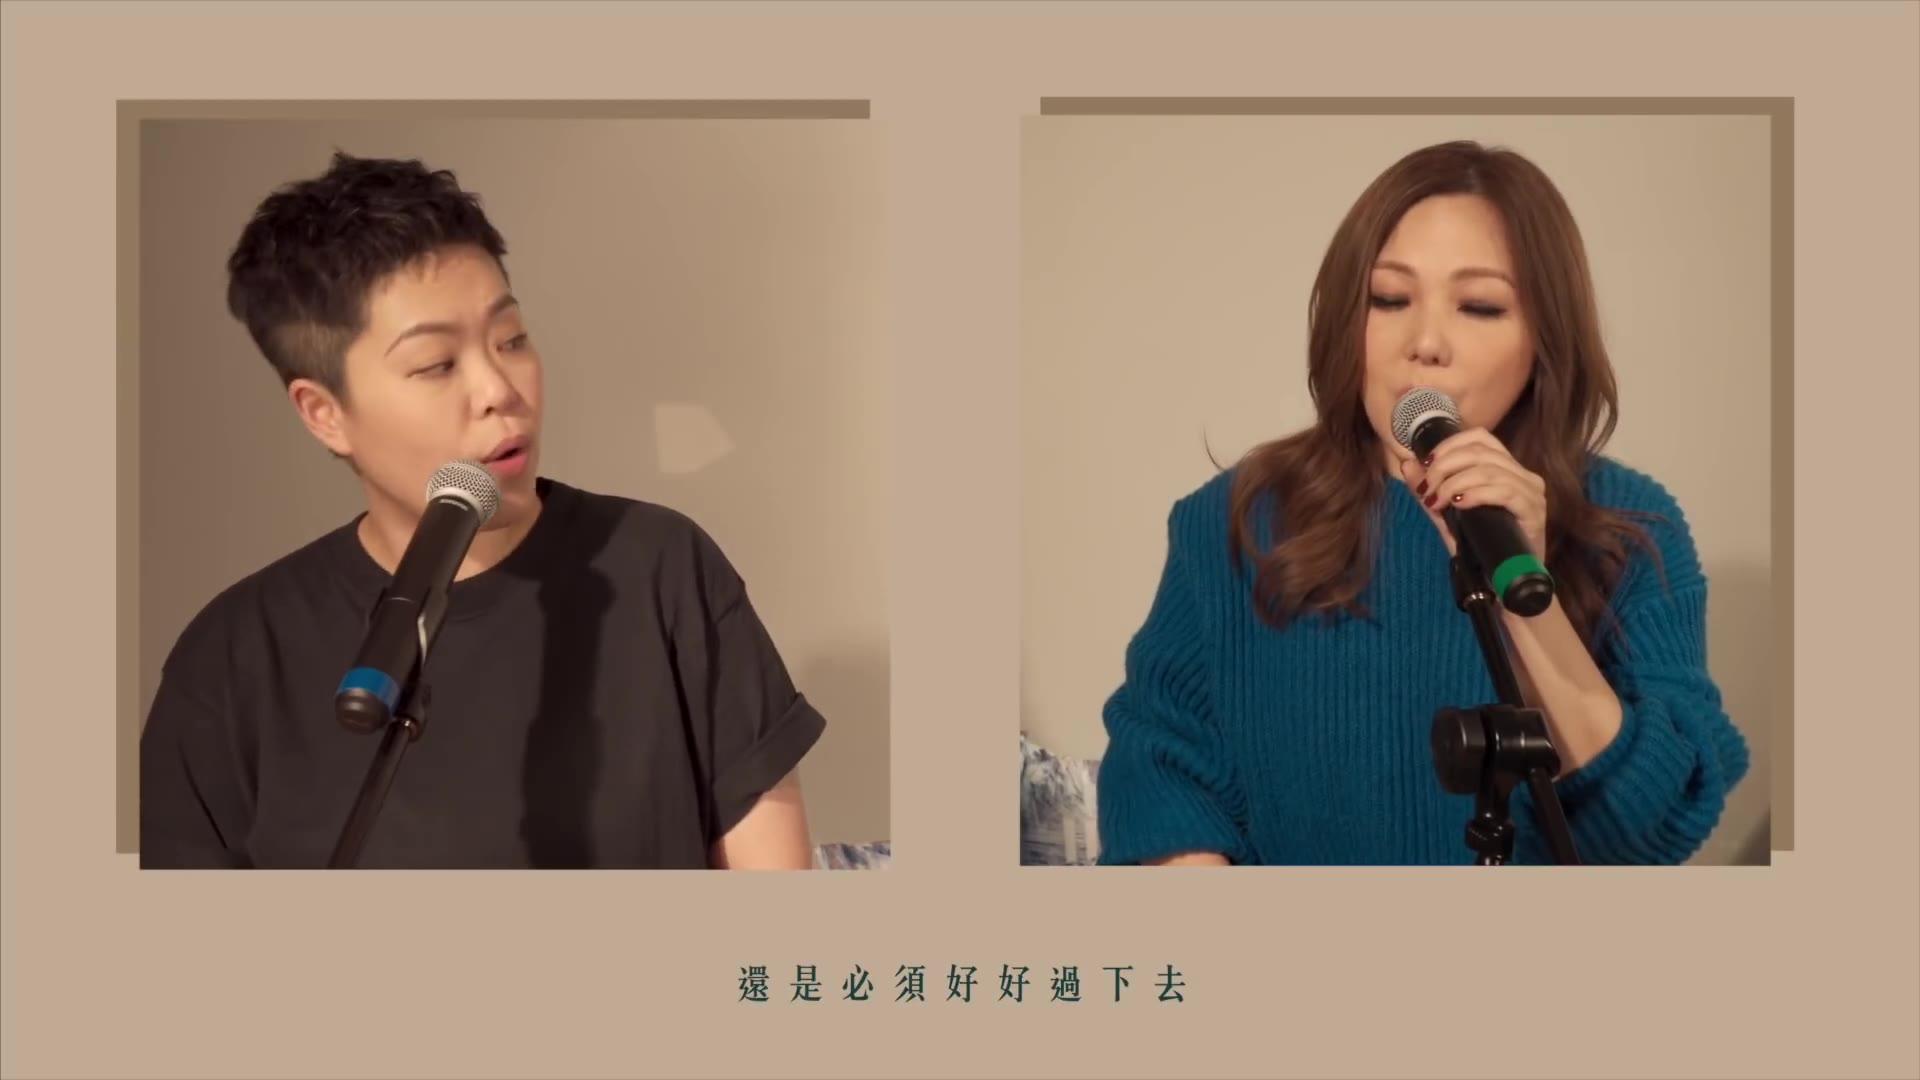 衛蘭 Janice x 林二汶 Eman - 最後的信仰 (cover version)